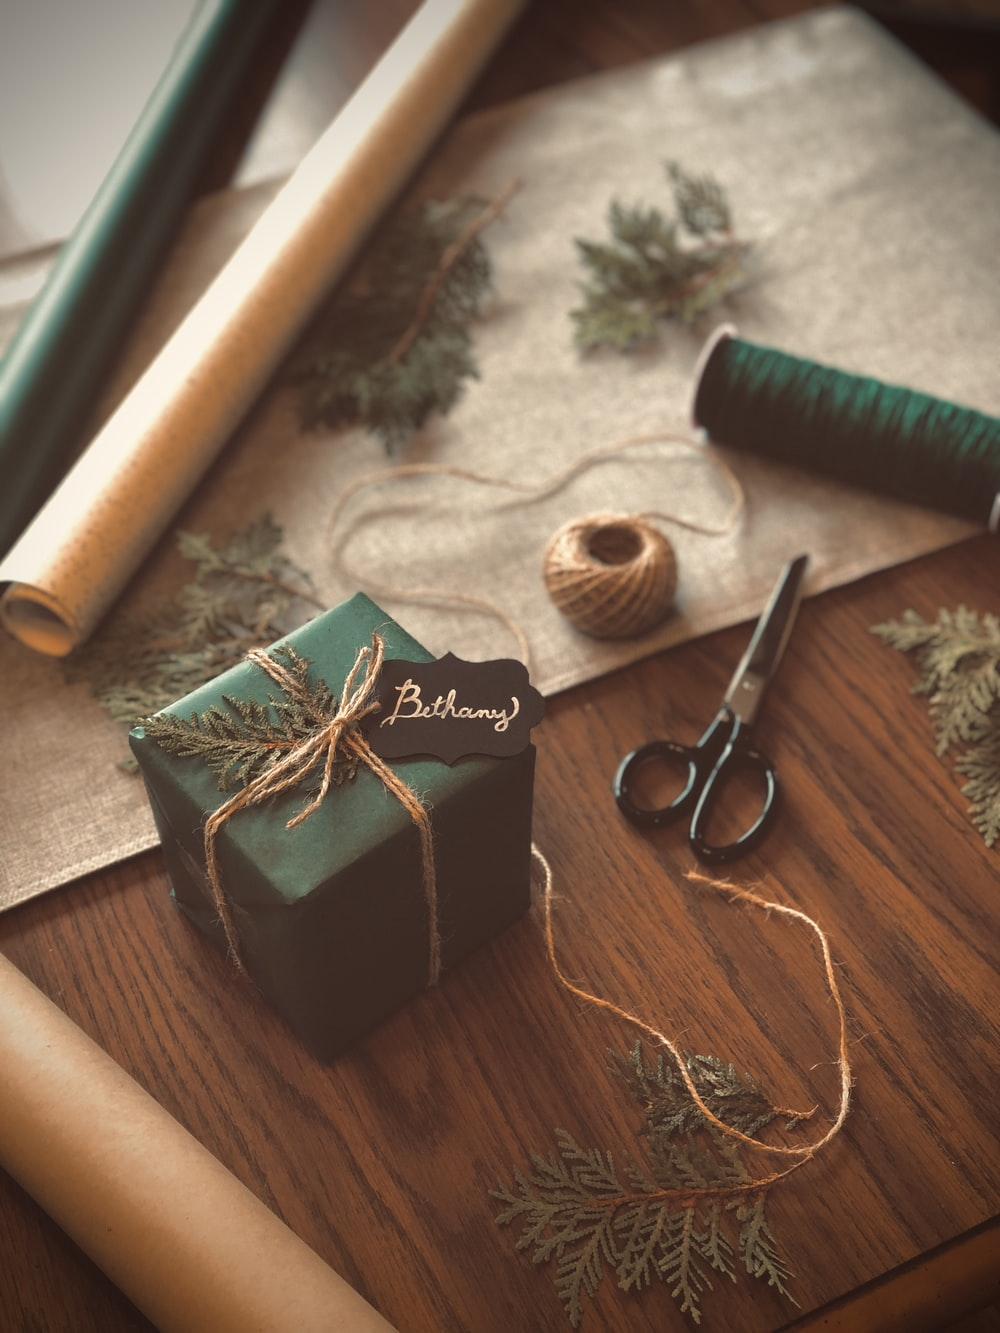 green thread beside brown thread and green thread